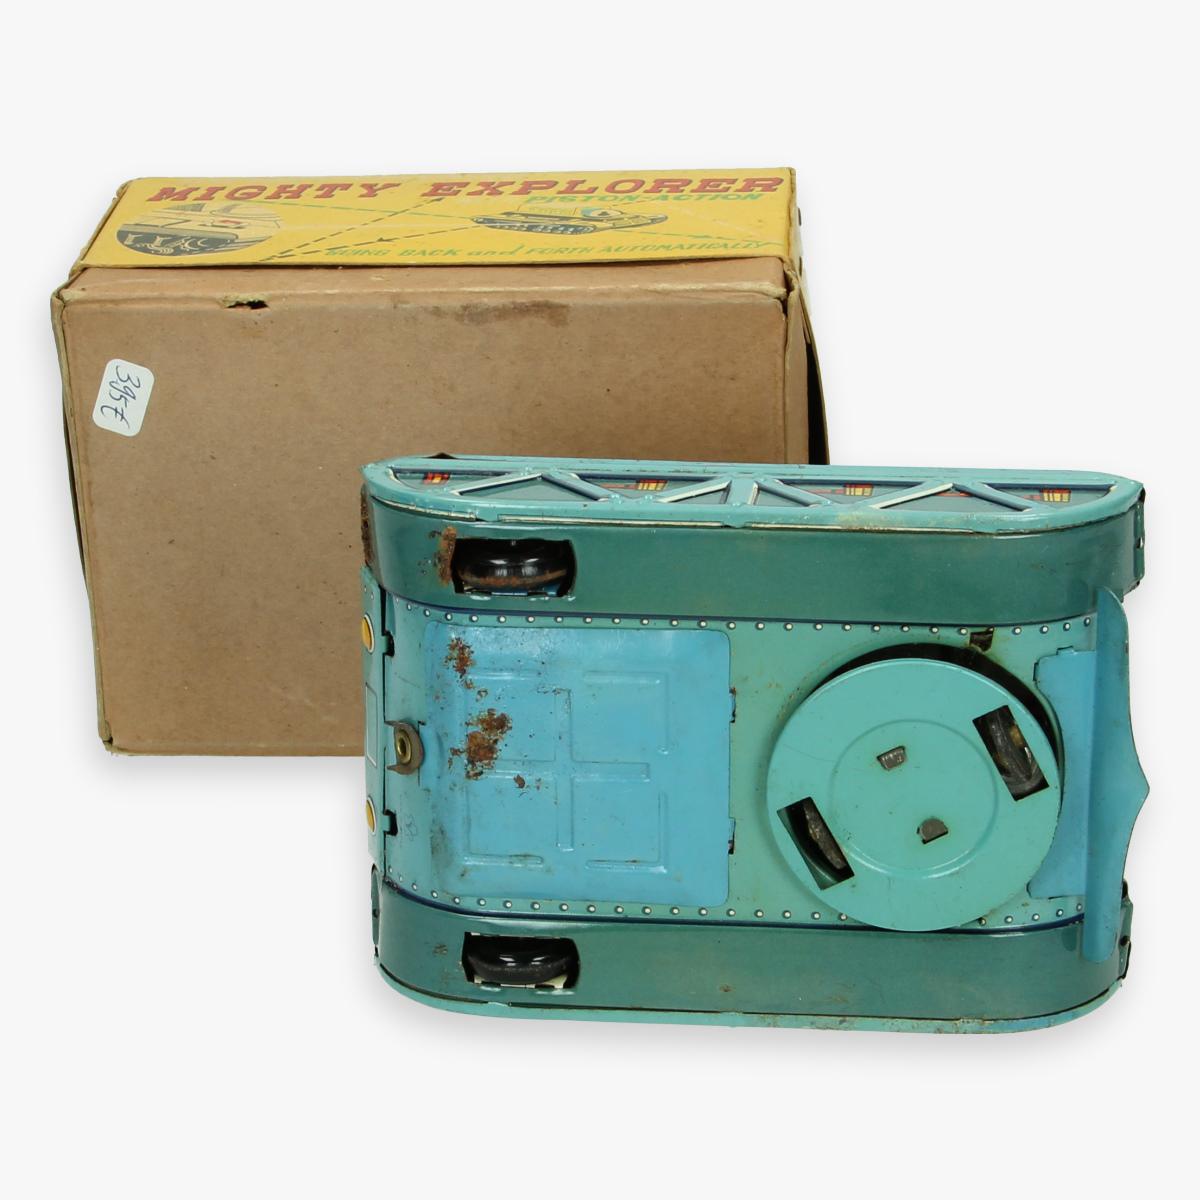 Afbeeldingen van mighty exployer yonezana boxed made in japan  space tank  n- 58 boxed